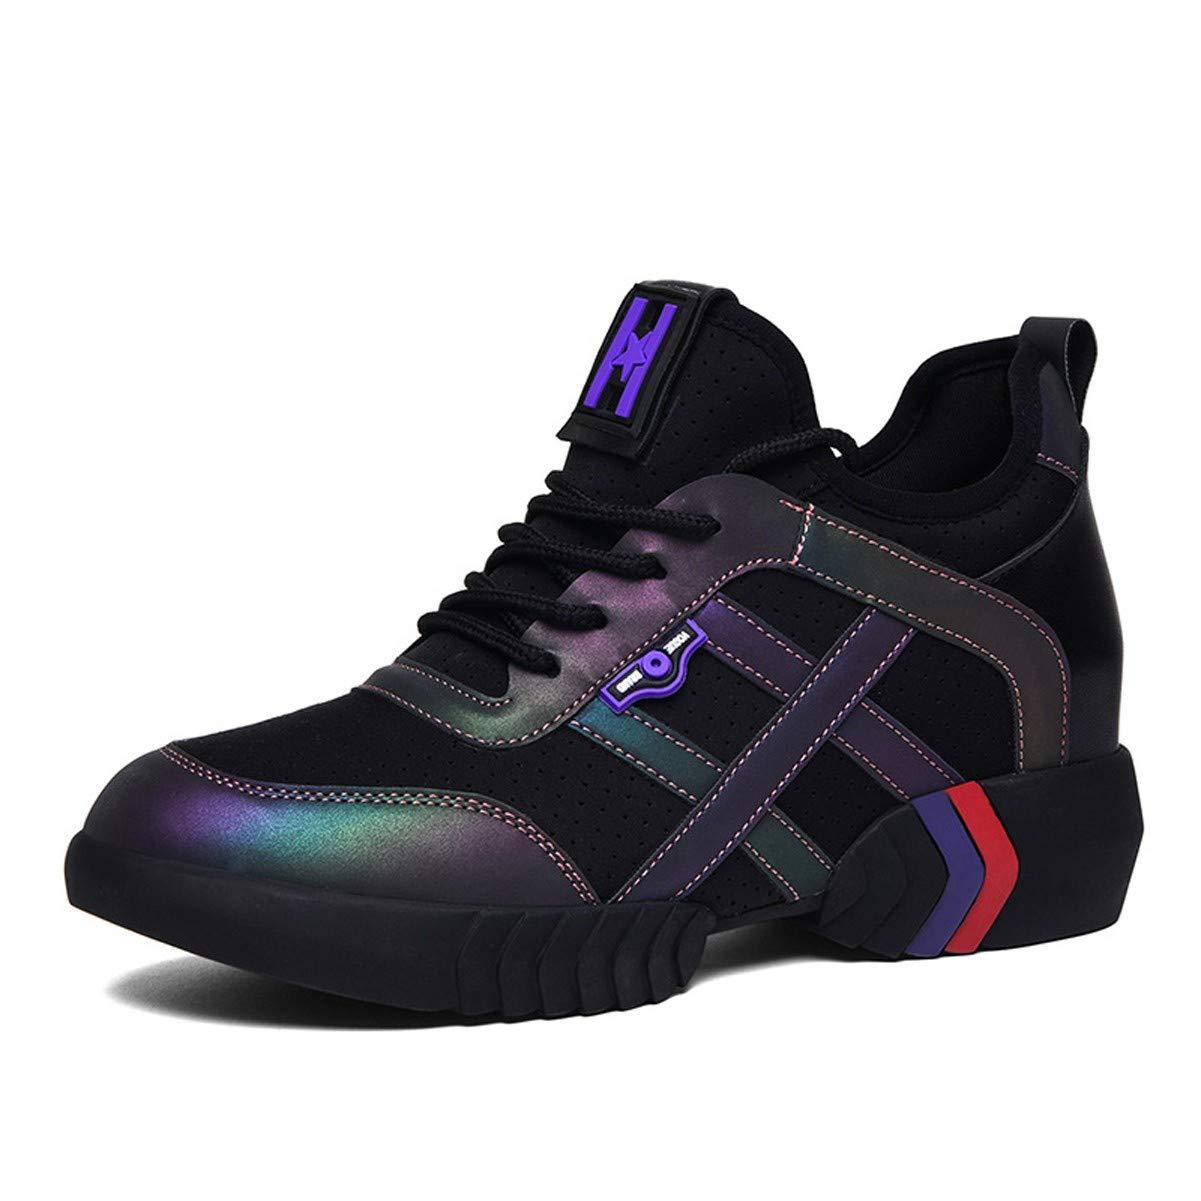 GTVERNH Frauen - Schuhe Damen - Freizeit - Sport - Frauen Schuhe Schuhe  Koreanischen Version Damenschuhe 256356fb73